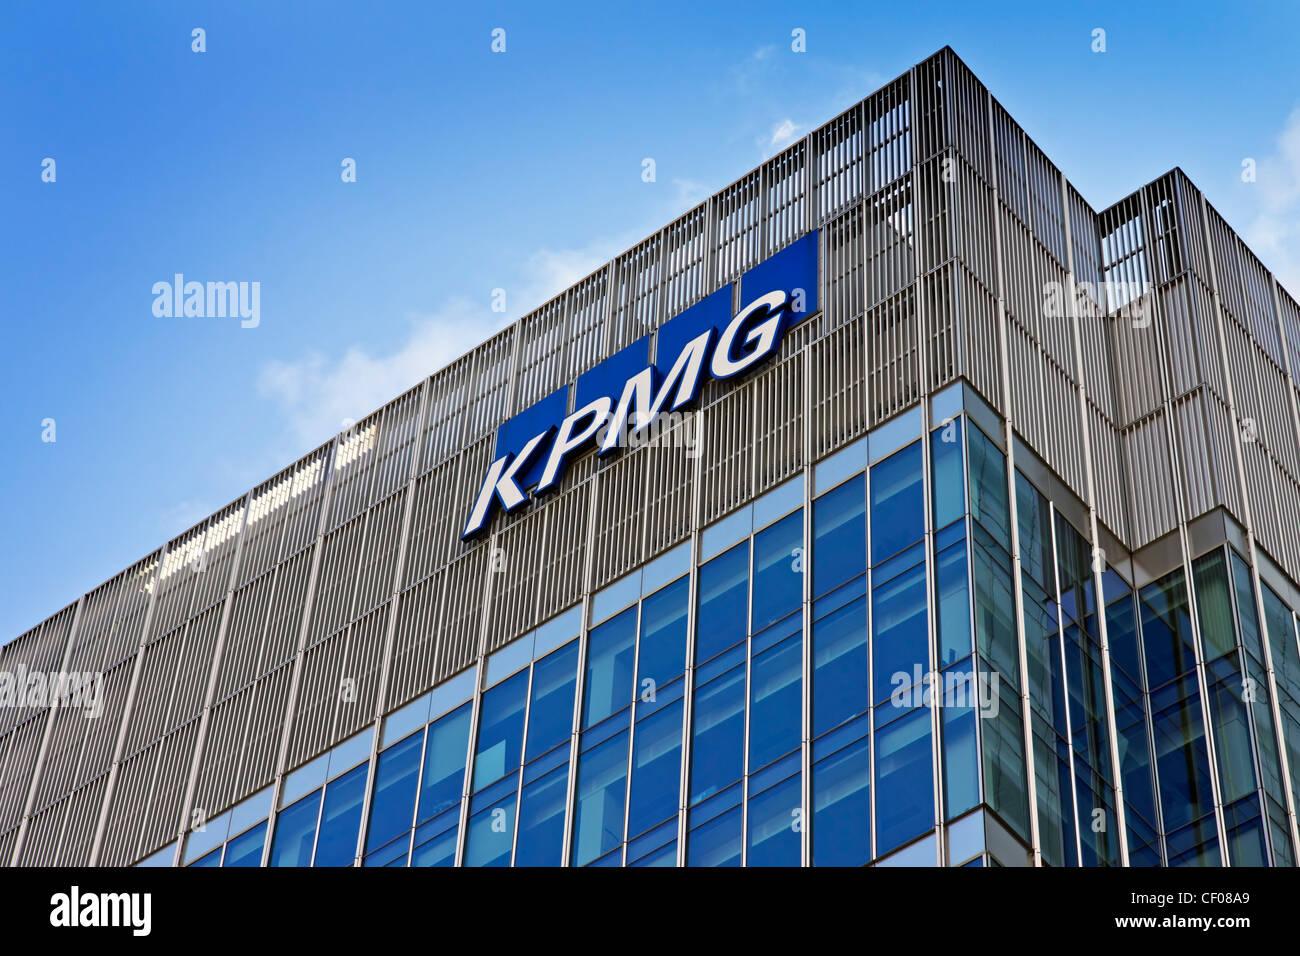 KPMG building in Docklands London England - Stock Image